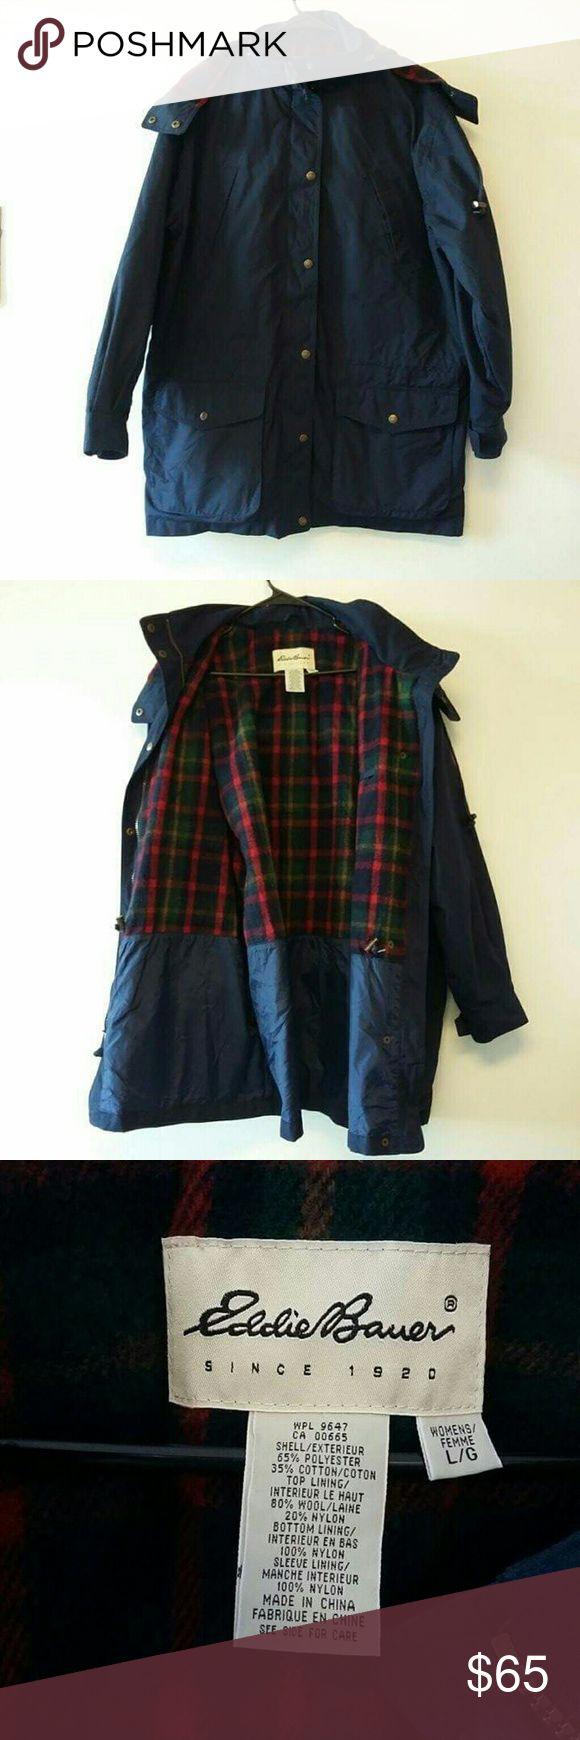 Eddie Bauer navy blue parka Shell: 65% polyester, 35% cotton, Top lining: 80% wool, 20% nylon, Bottom lining: 100% nylon. Eddie Bauer Jackets & Coats